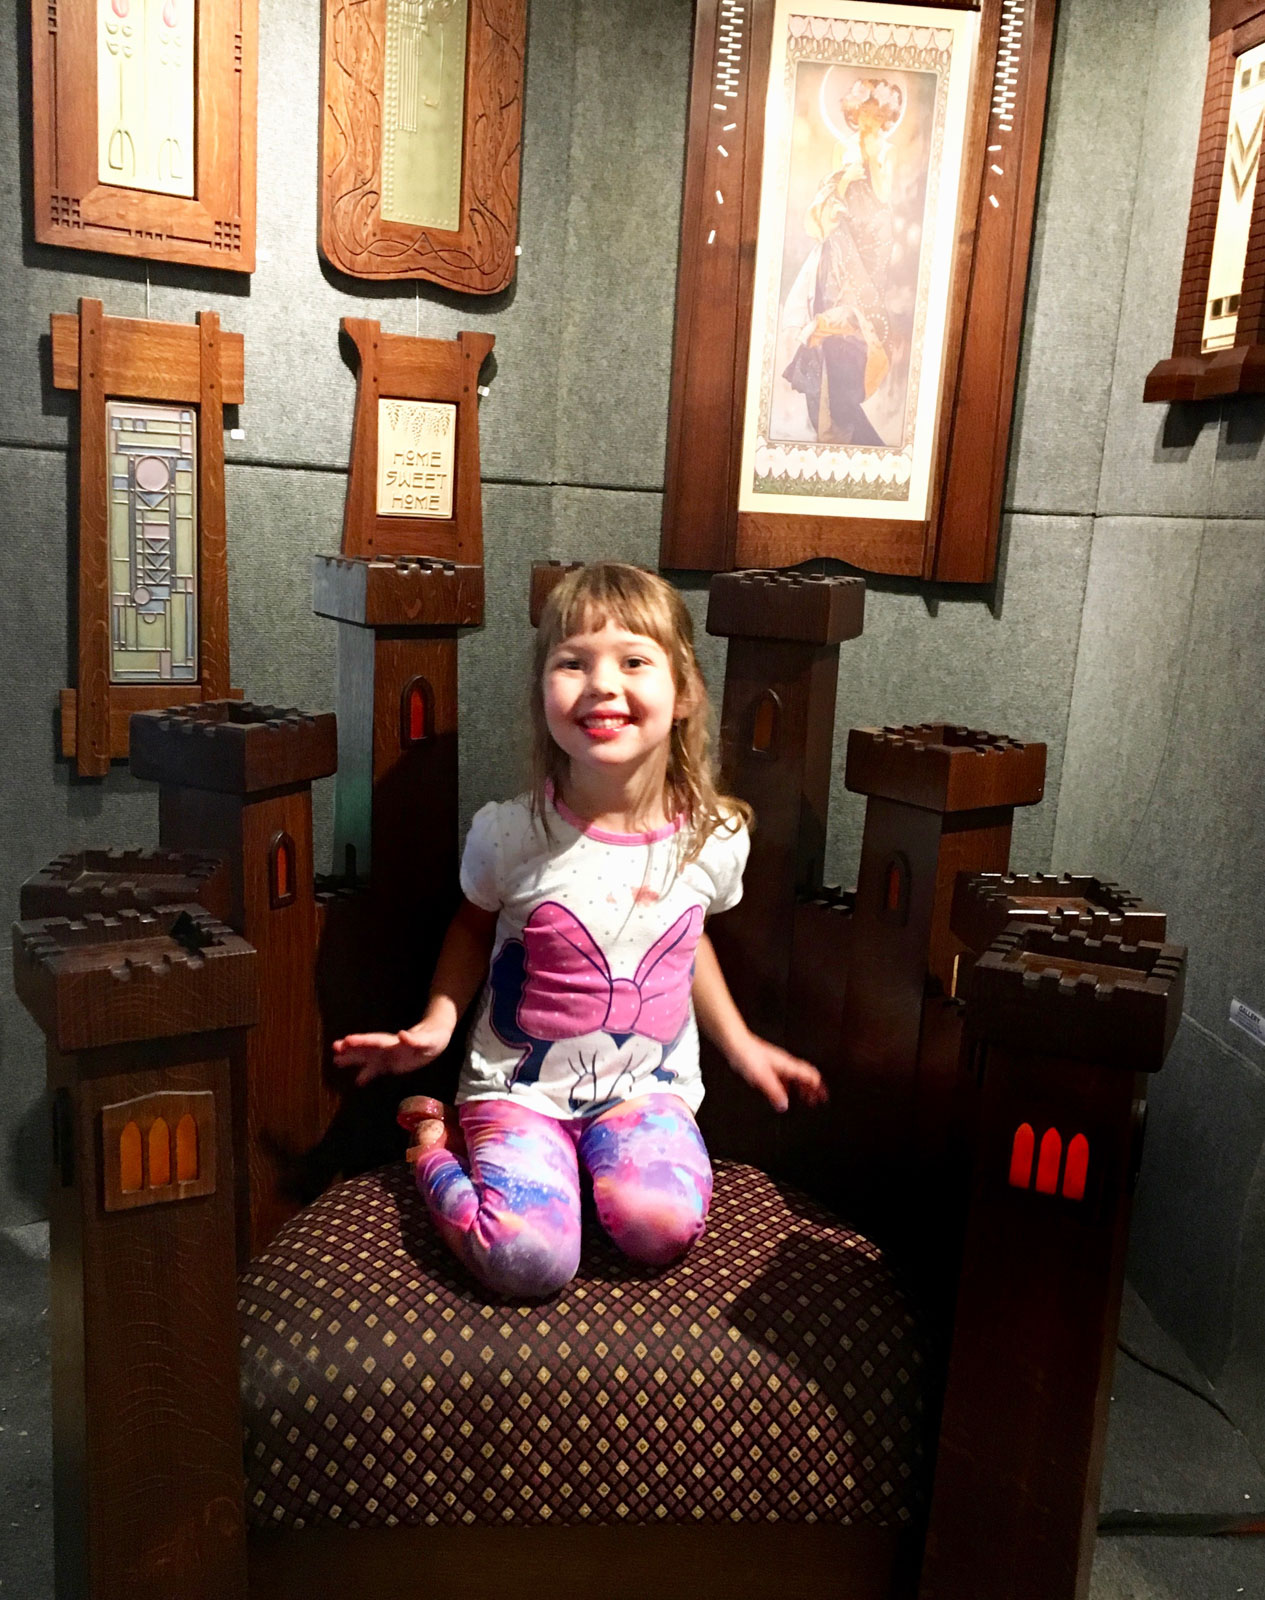 Mission Guild Studio Chair, Woodstock-New Paltz Art & Crafts Fair